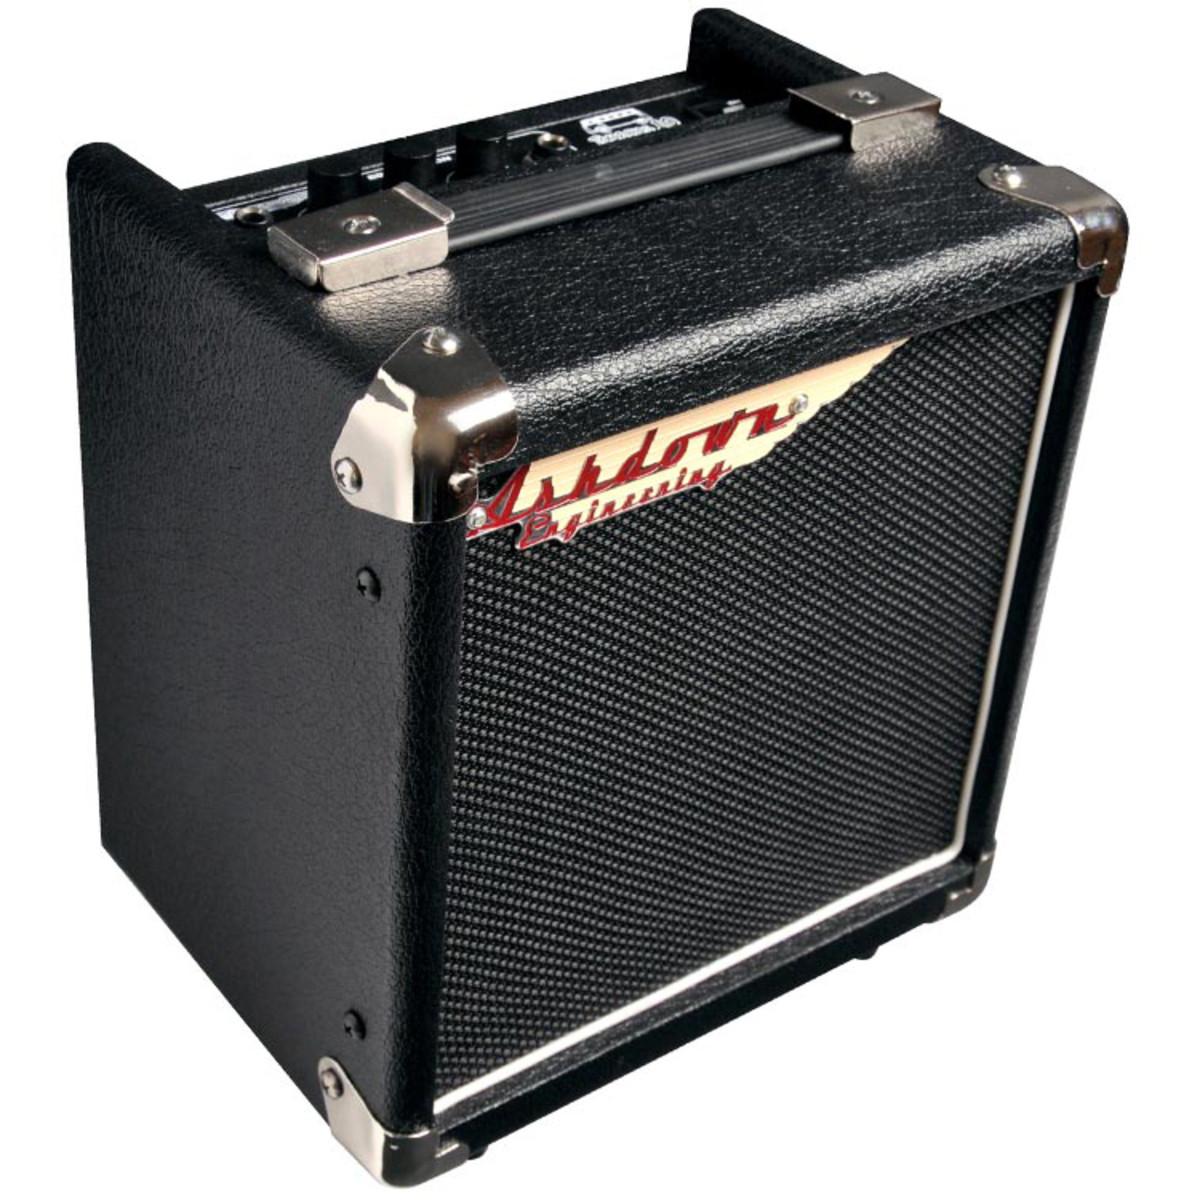 ashdown tourbus 10 practice bass amp at gear4music. Black Bedroom Furniture Sets. Home Design Ideas